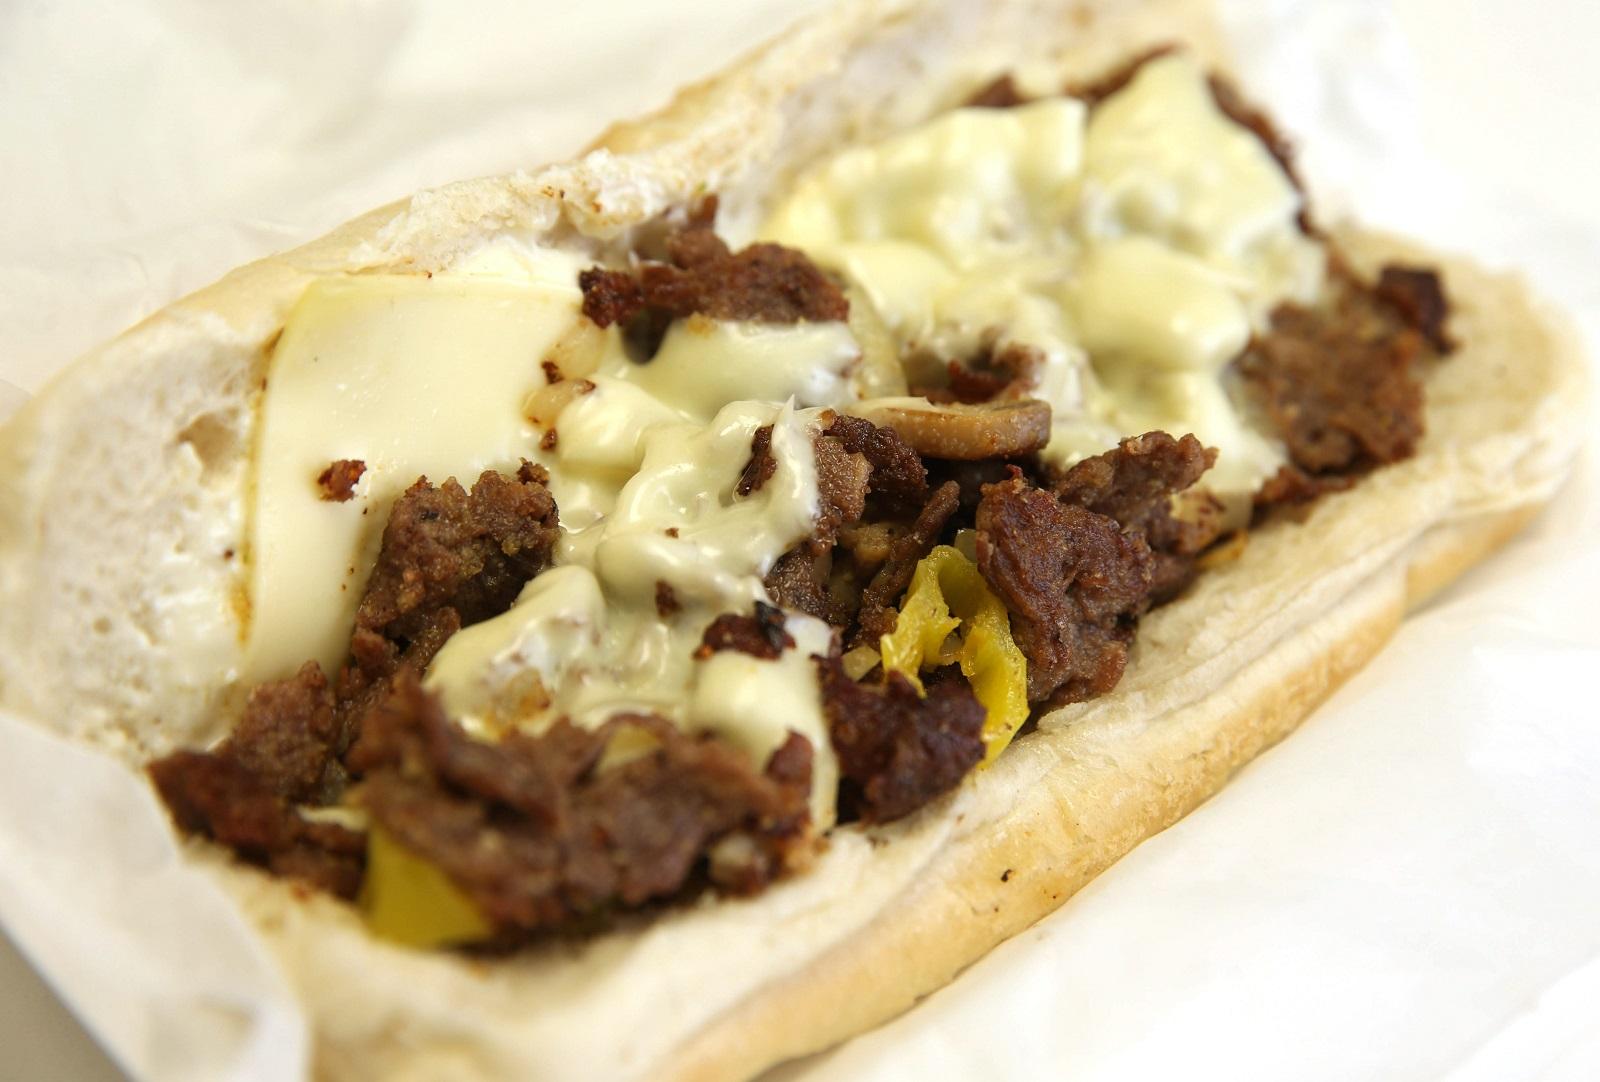 Philly cheesesteak sandwich from DJ Cafeteria. (Sharon Cantillon/Buffalo News)